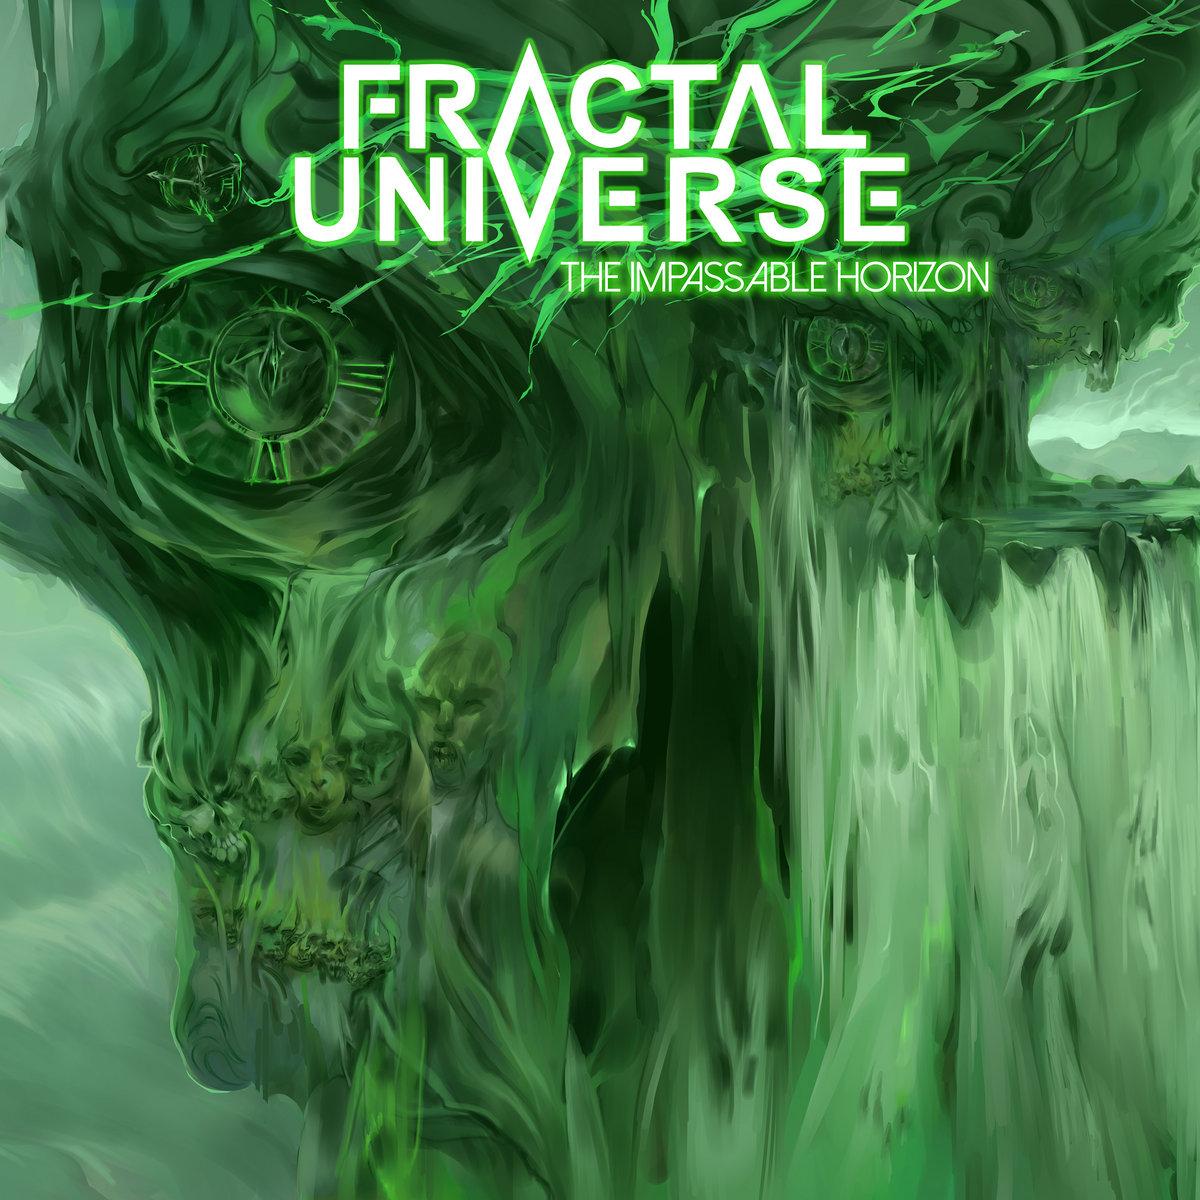 The Impassable Horizon fractal universe